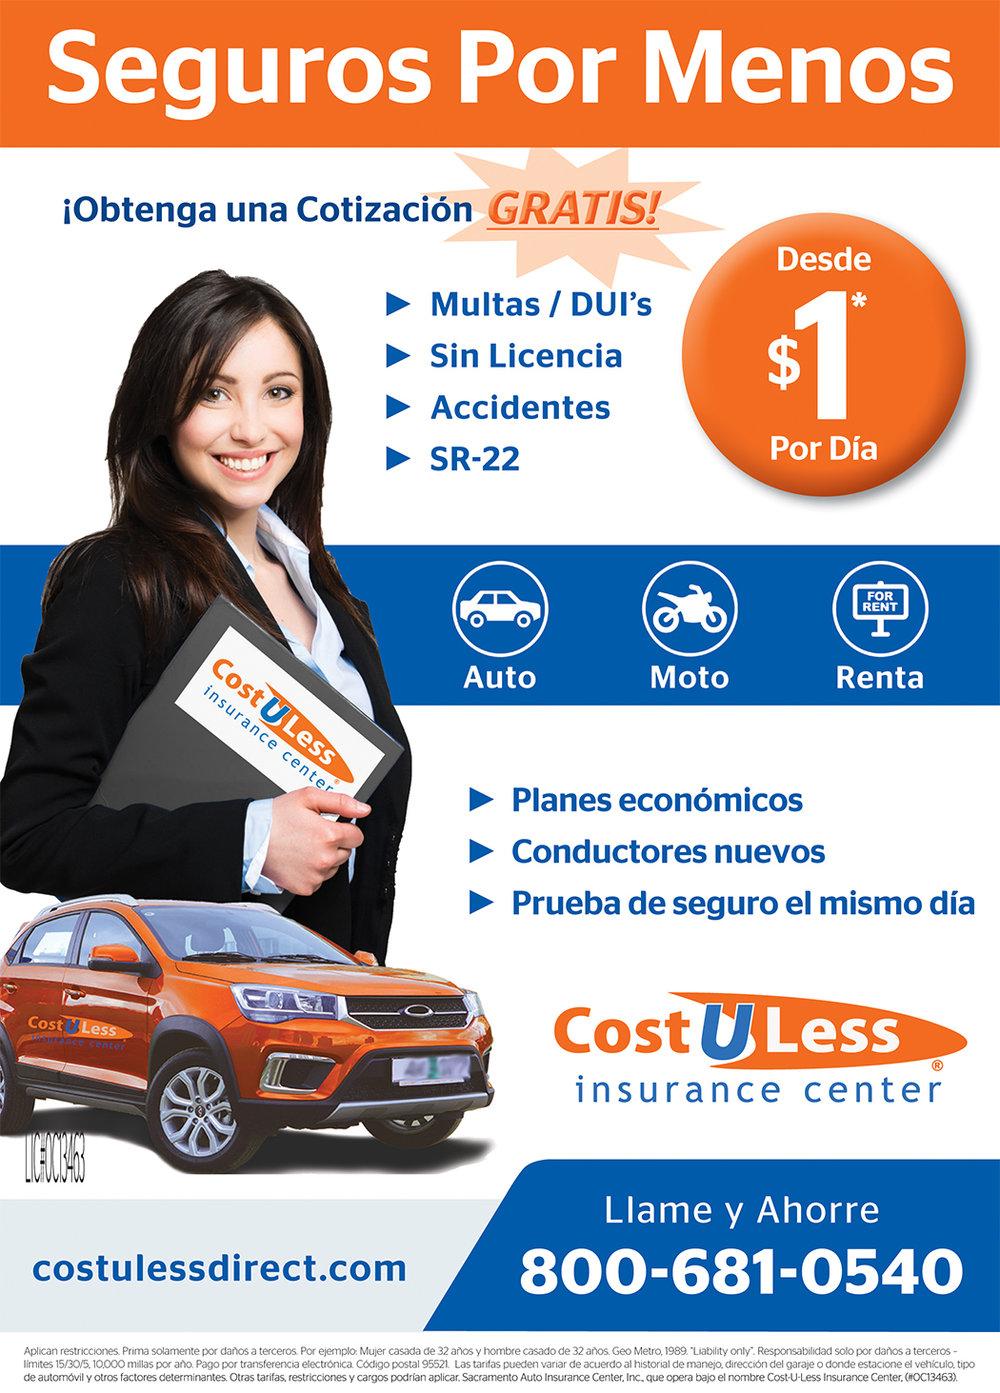 Cost U Less Insurance 1 Pag JULIO 2018-01 copy.jpg